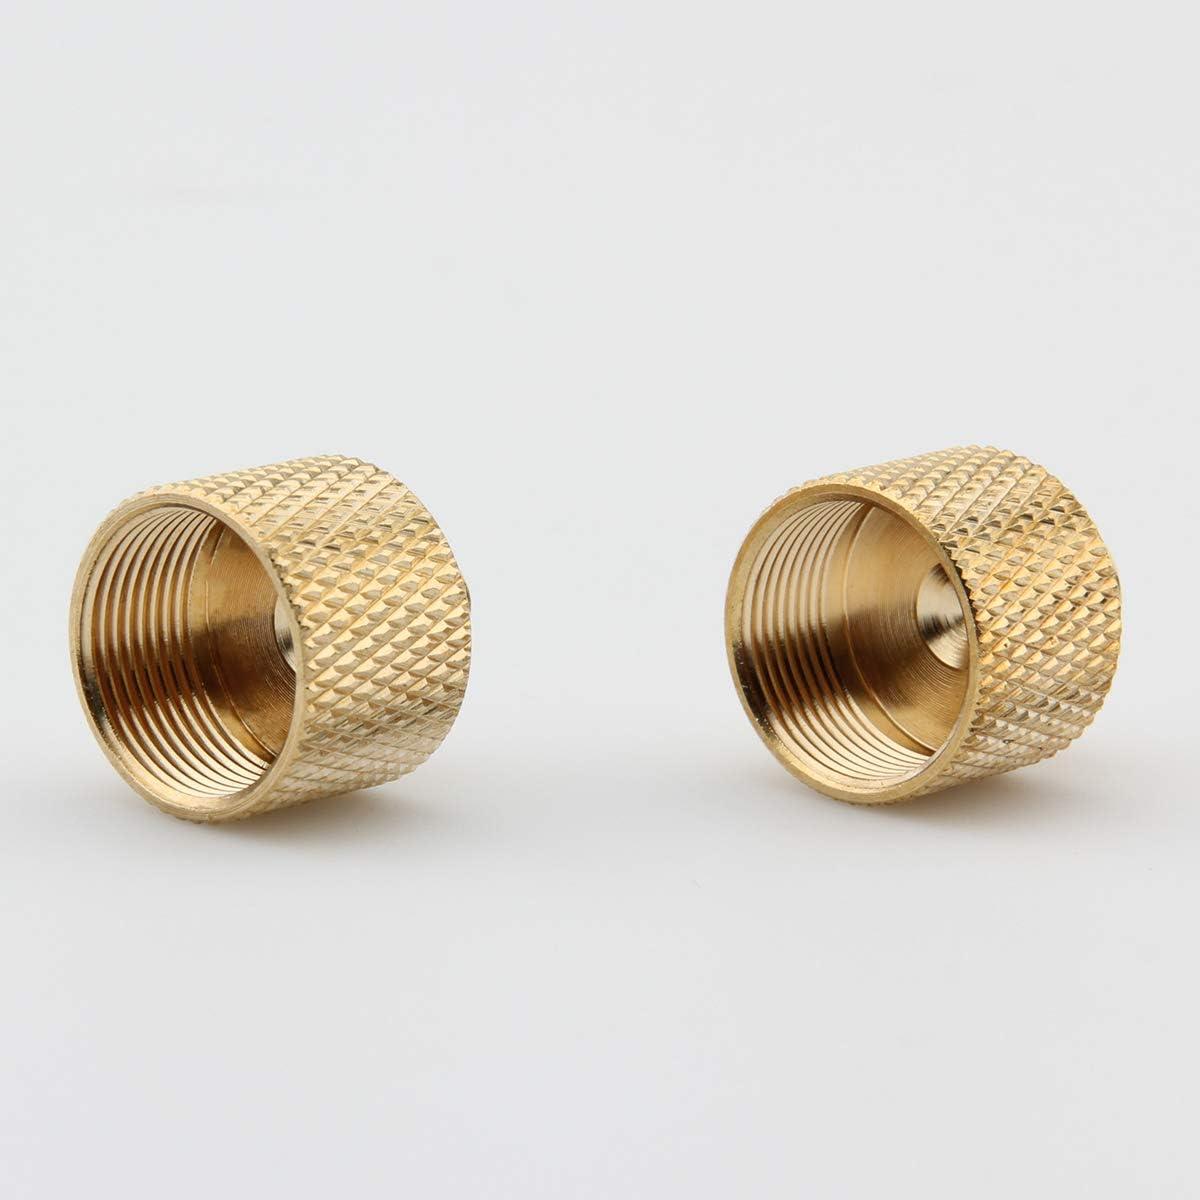 XINJUE 2 Pieces, tripod screw adapter converter stand screw. 3//8-16 External thread brass 5//8-27 internal thread adapter for microphone stand to